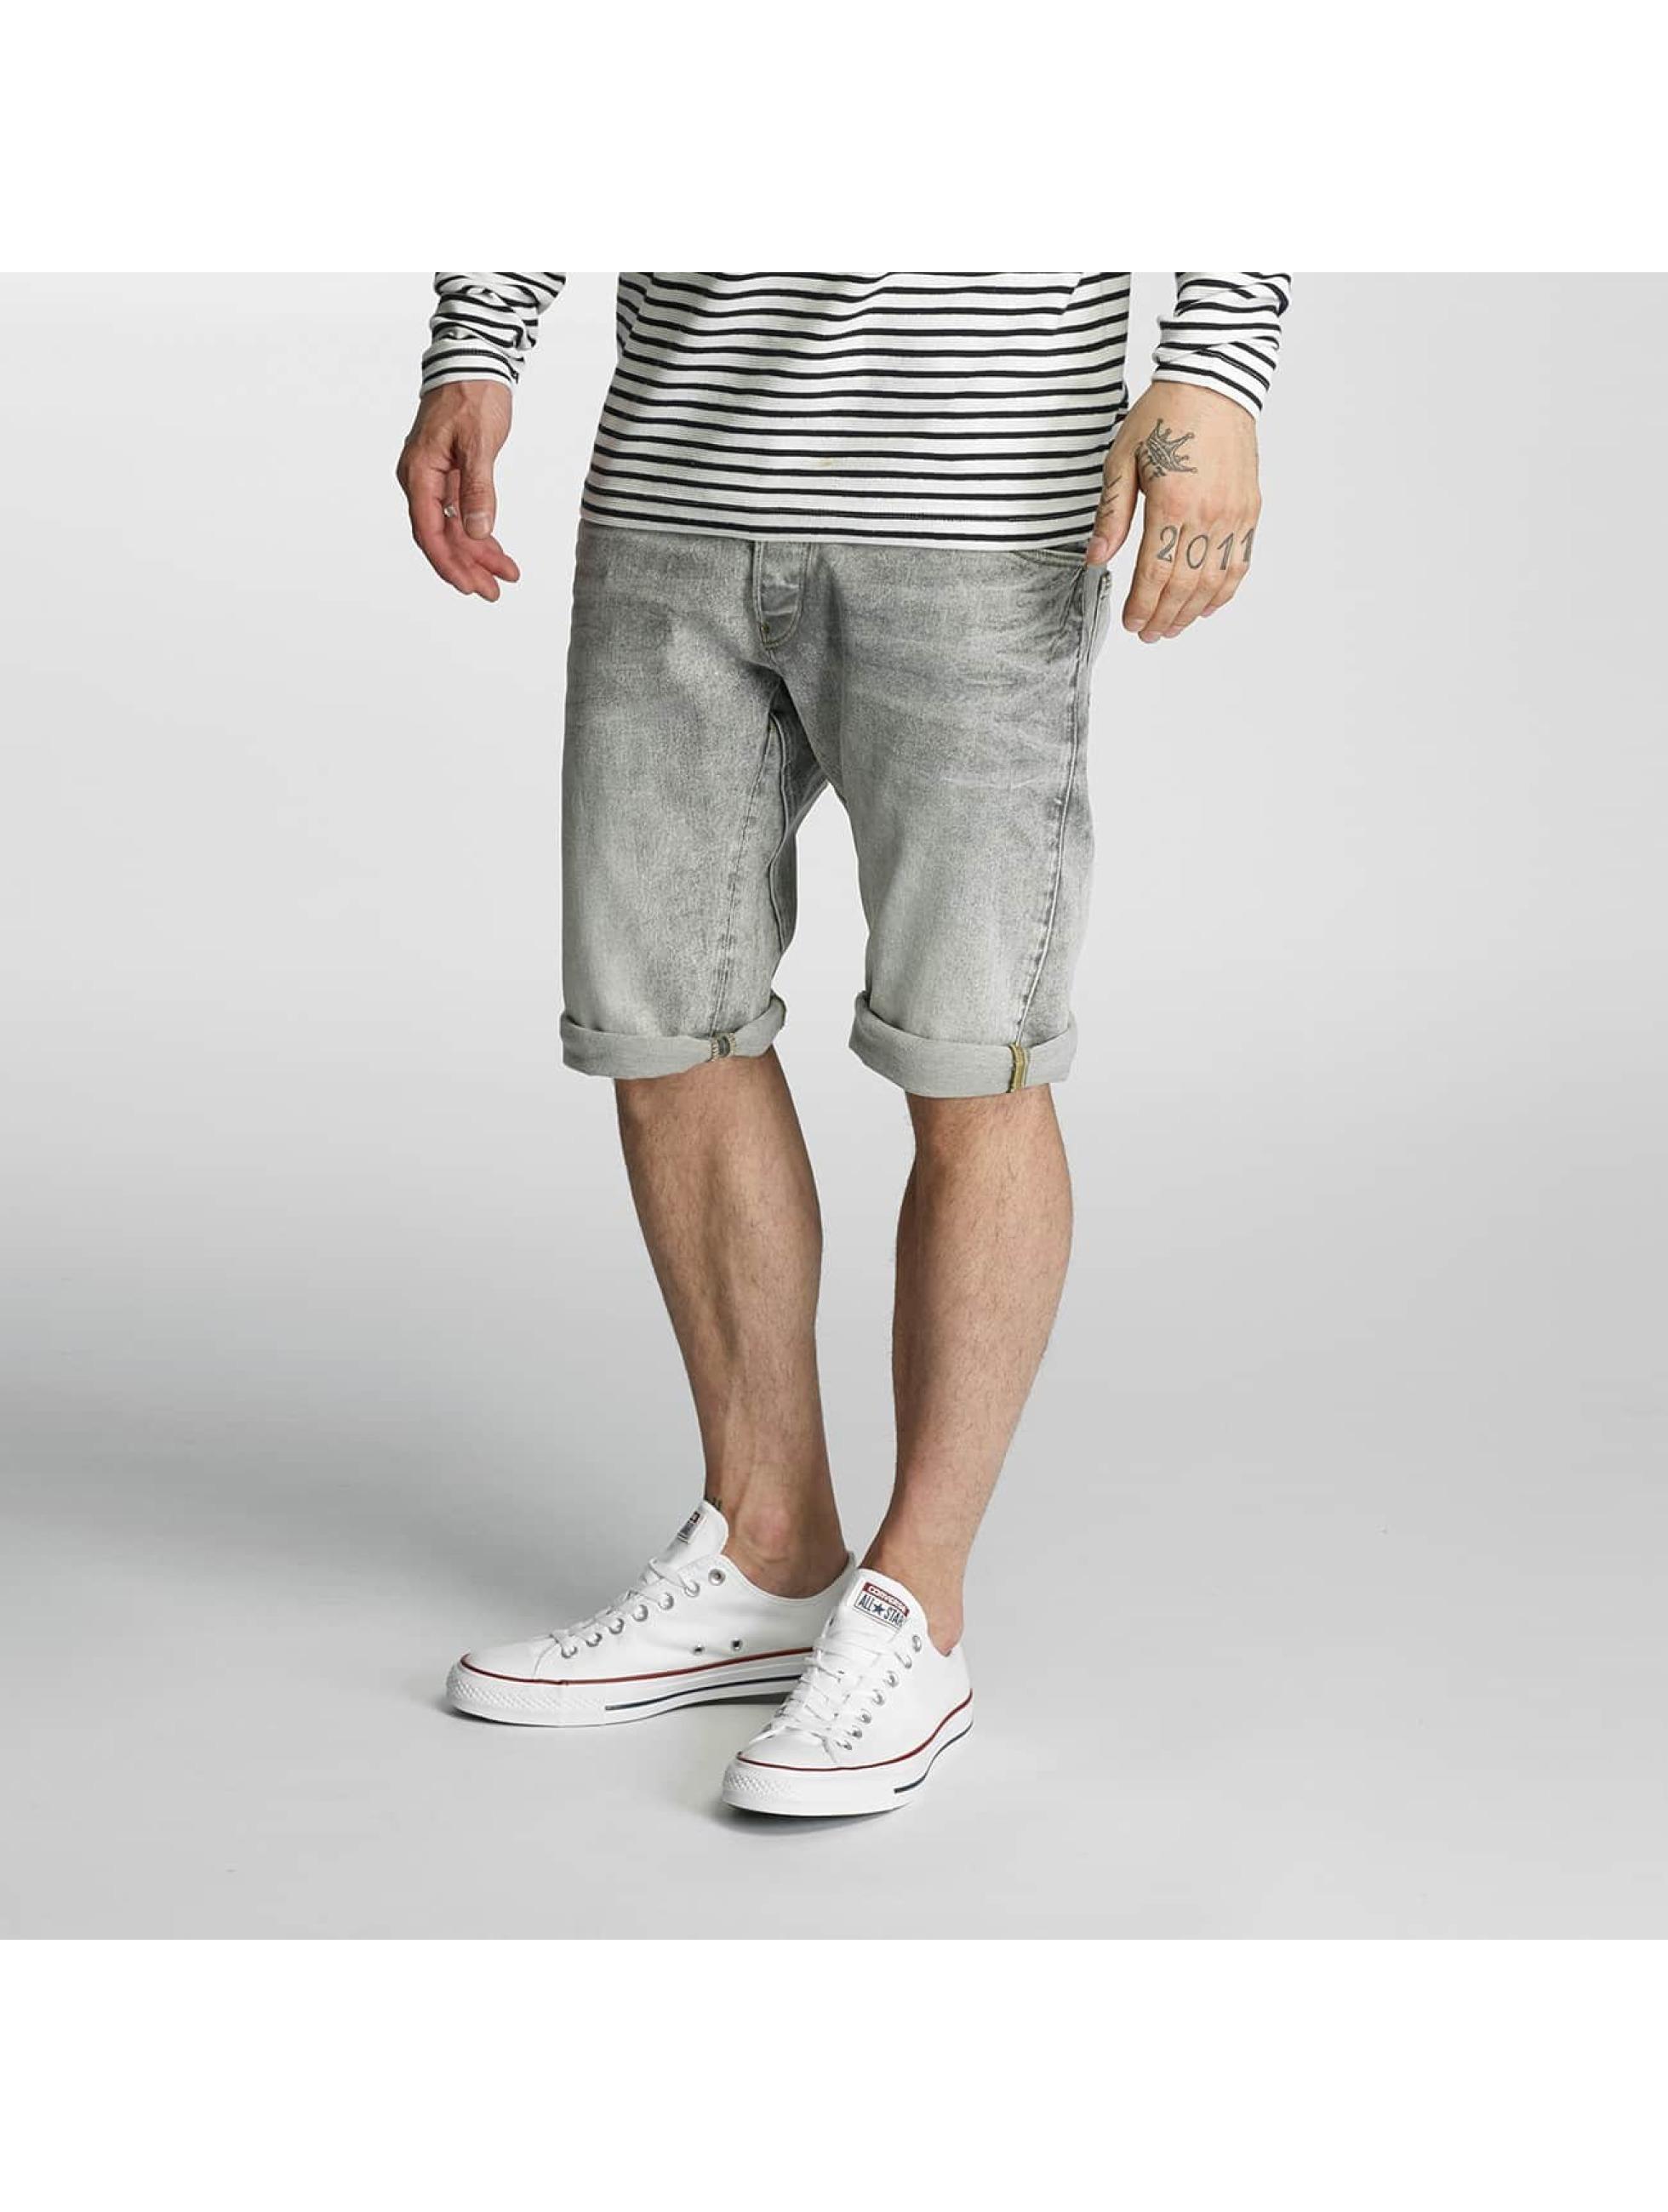 g star herren shorts arc 3d in grau 310186. Black Bedroom Furniture Sets. Home Design Ideas